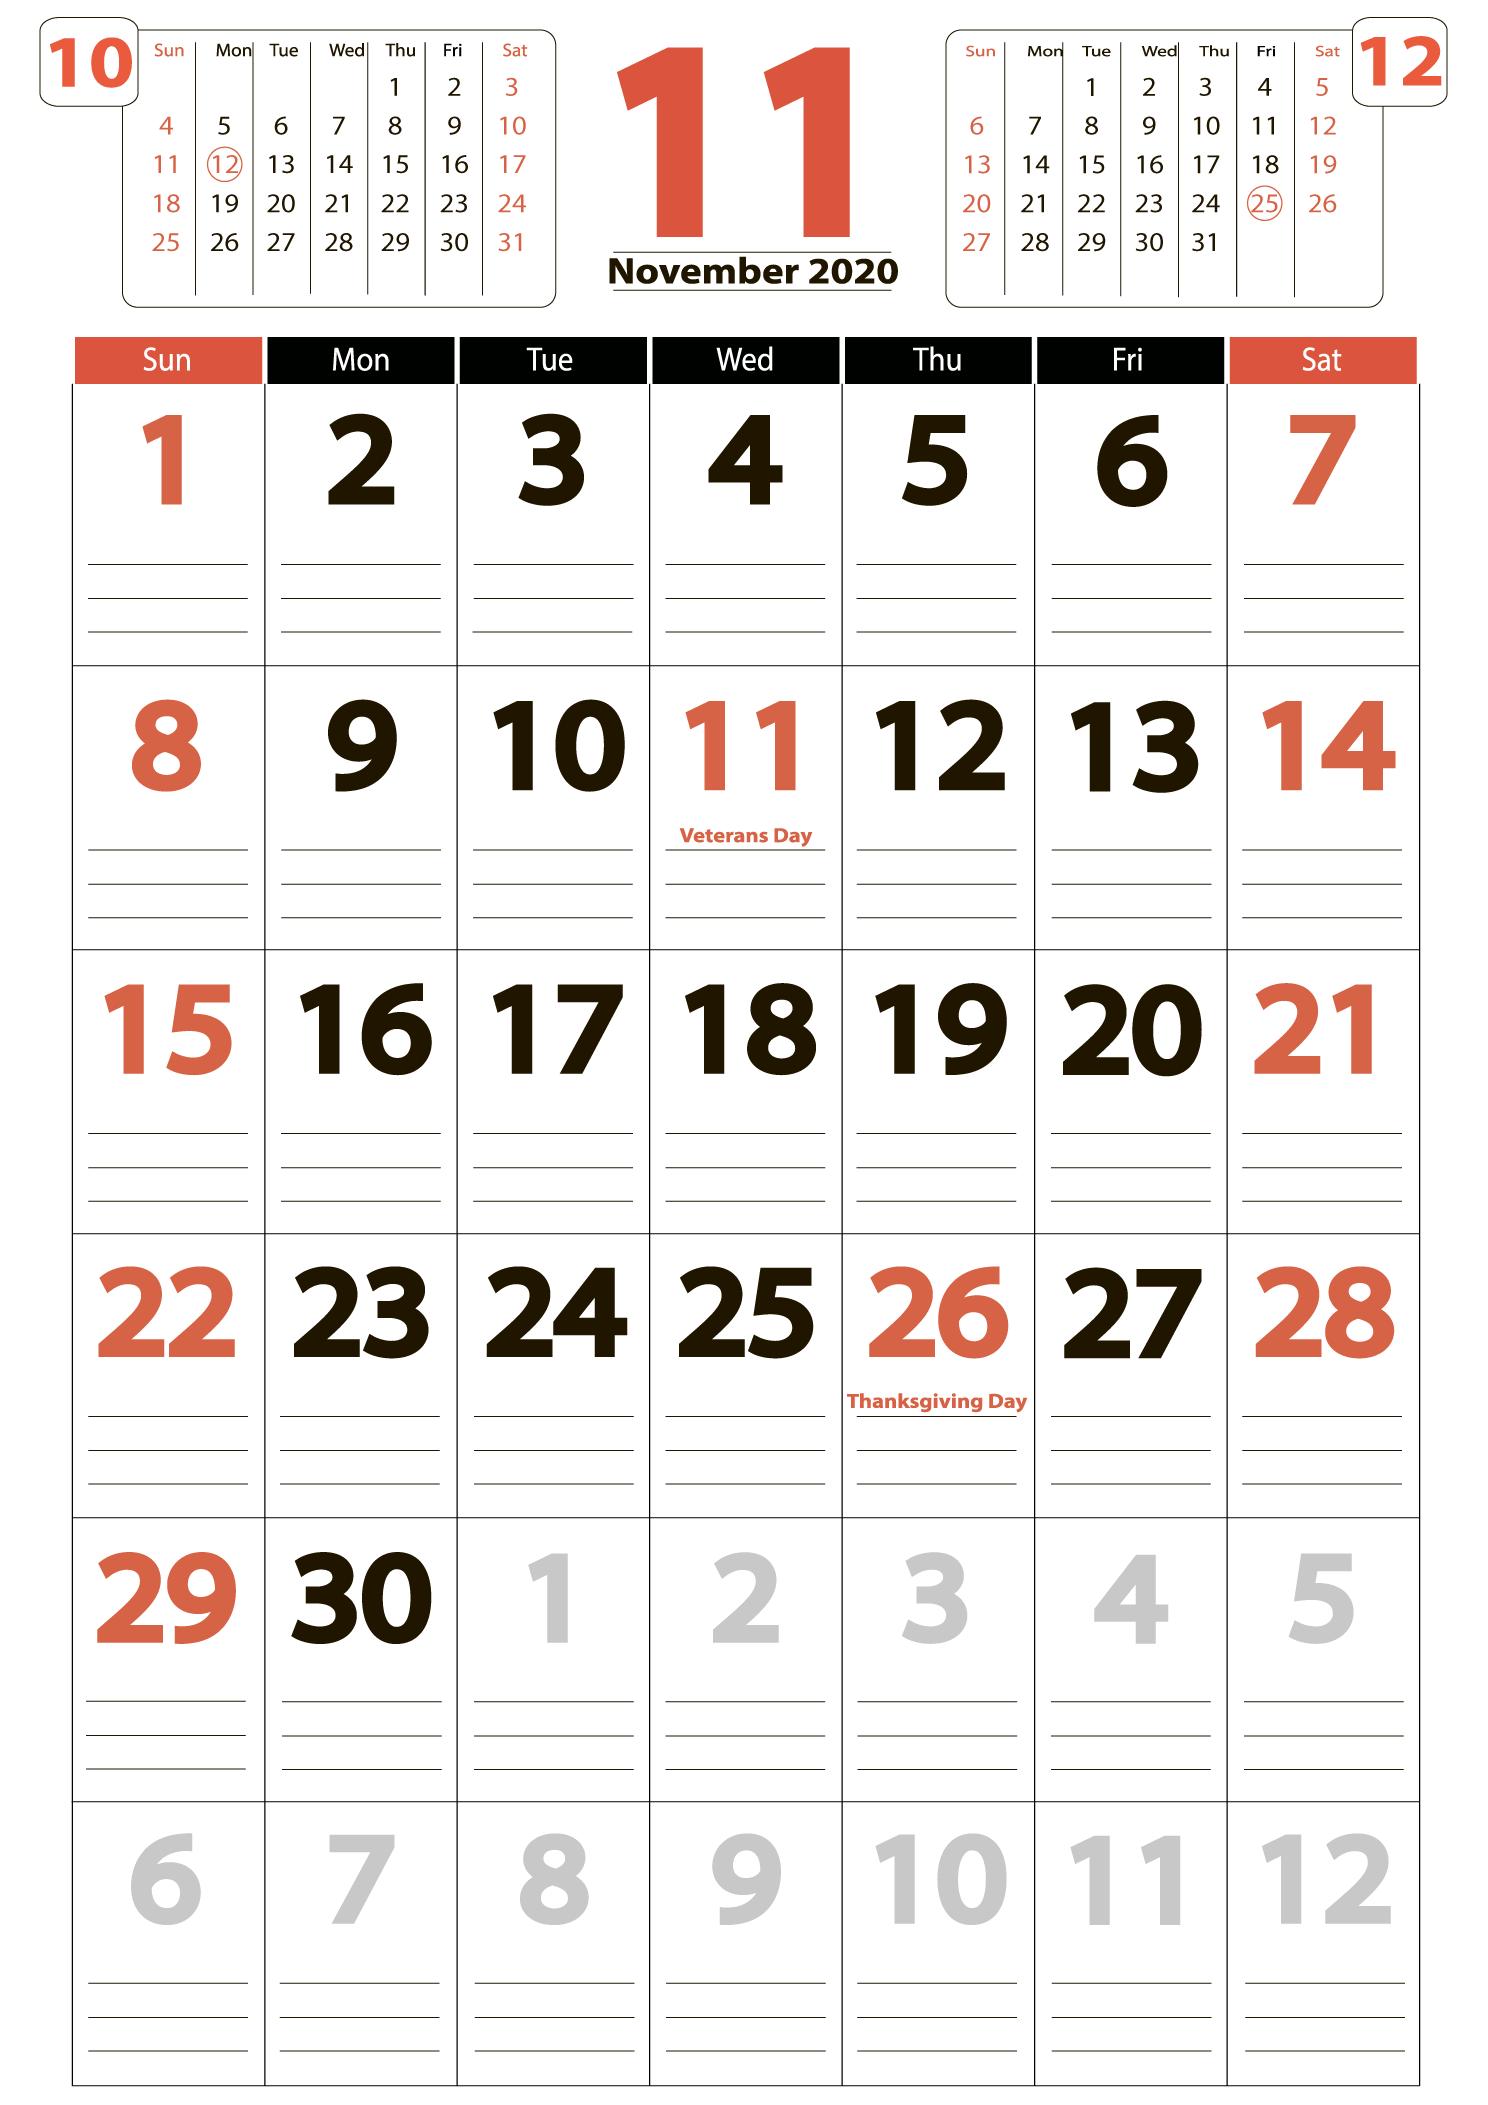 Download calendar november 2020